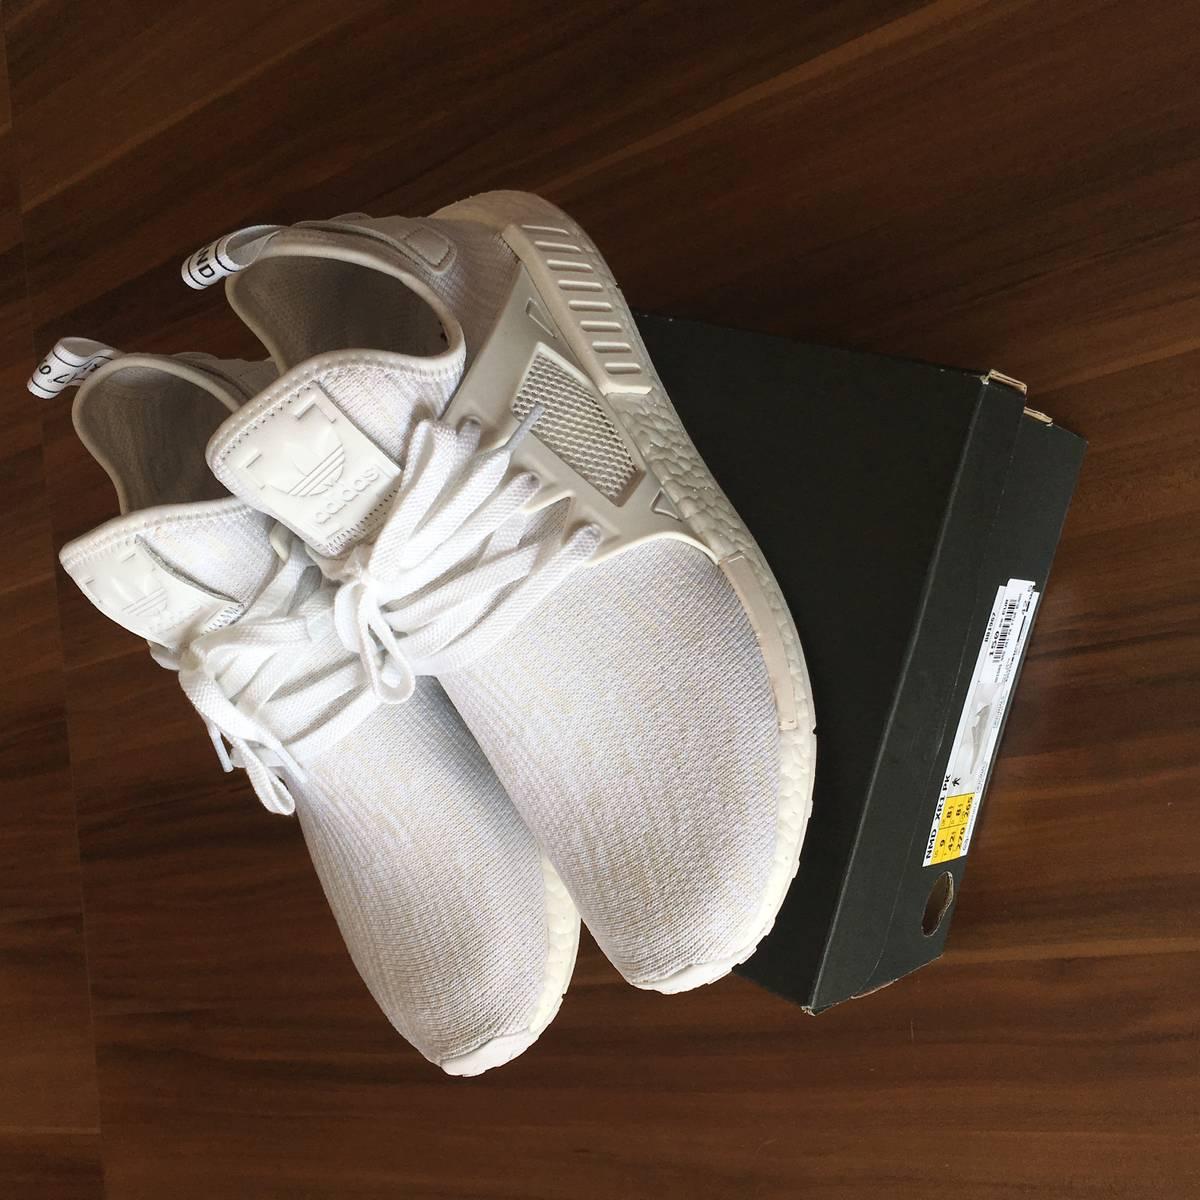 adidas NMD Xr1 White Duck Camo Primeknit Ba7233 Size 11